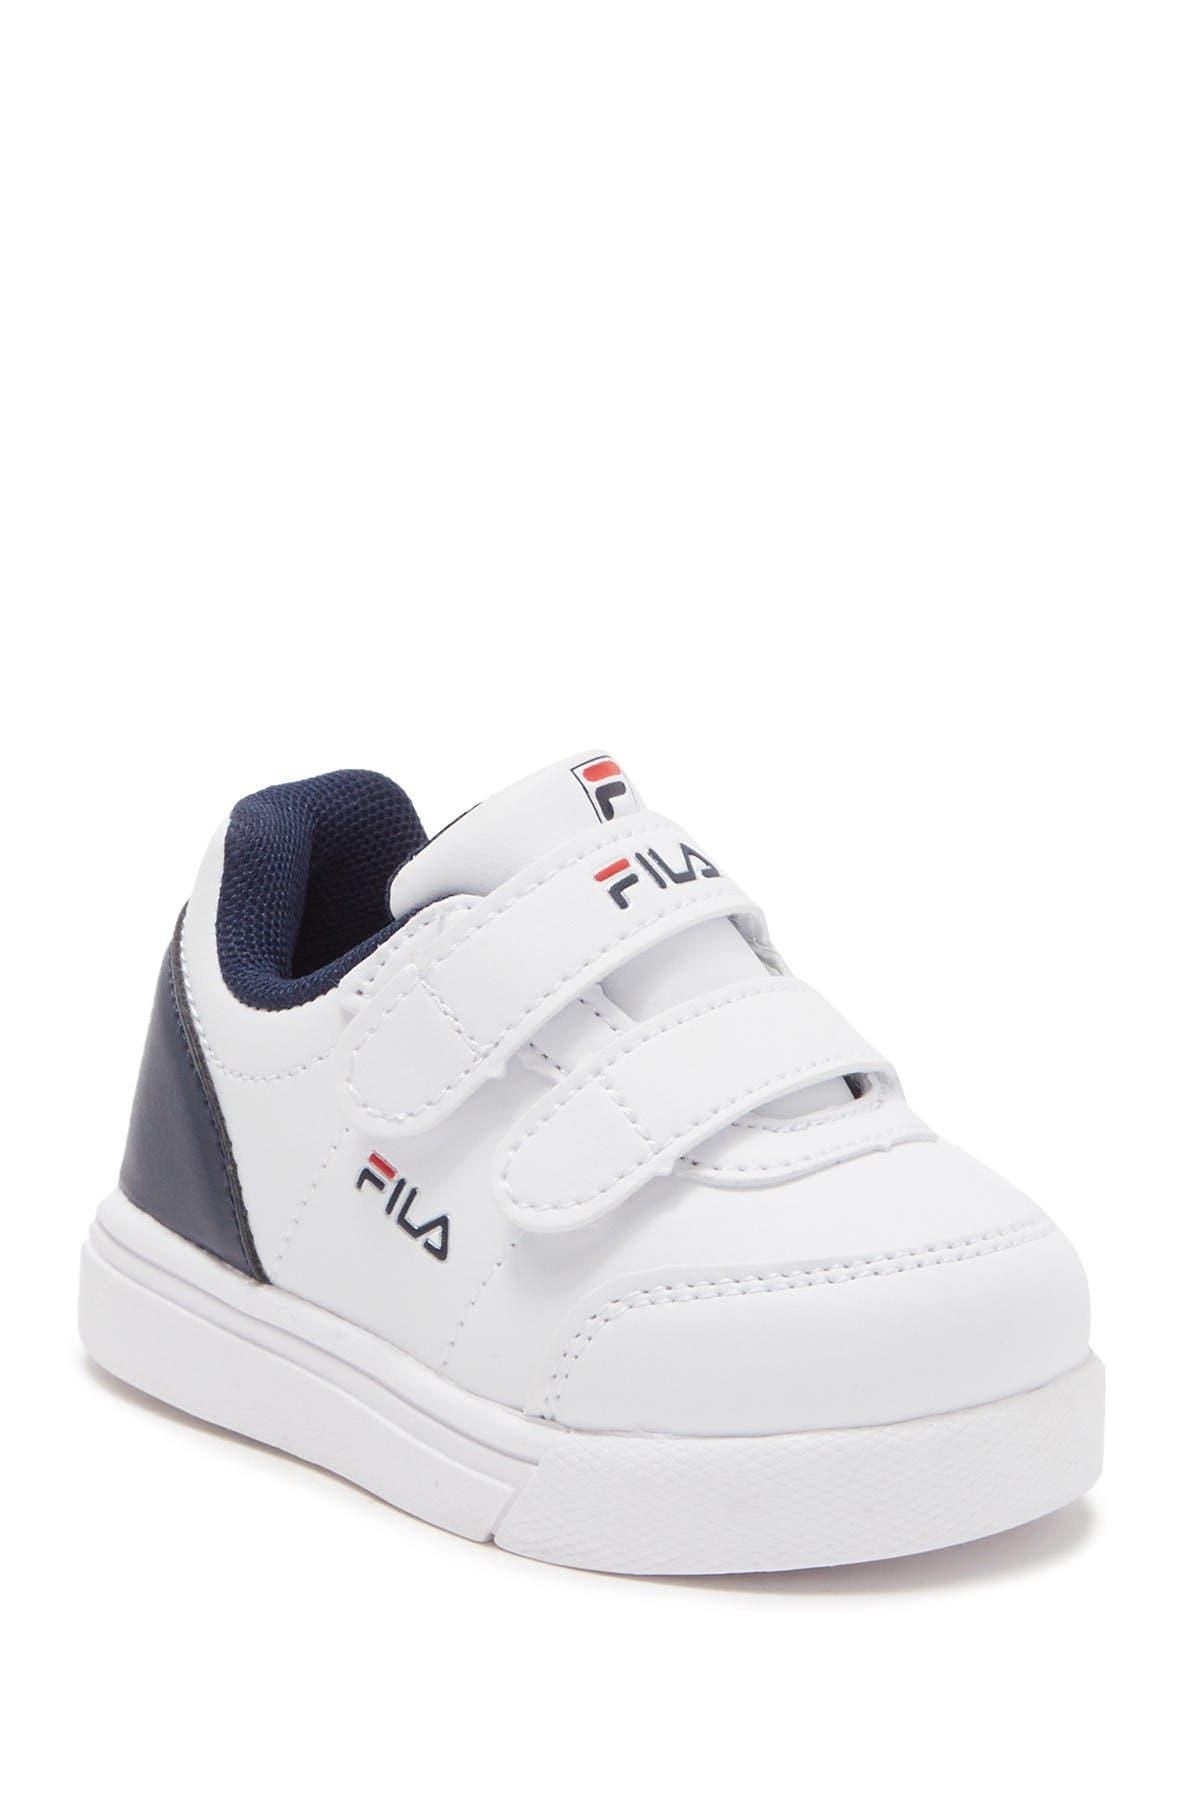 Image of FILA USA G1000 Strap Sneaker